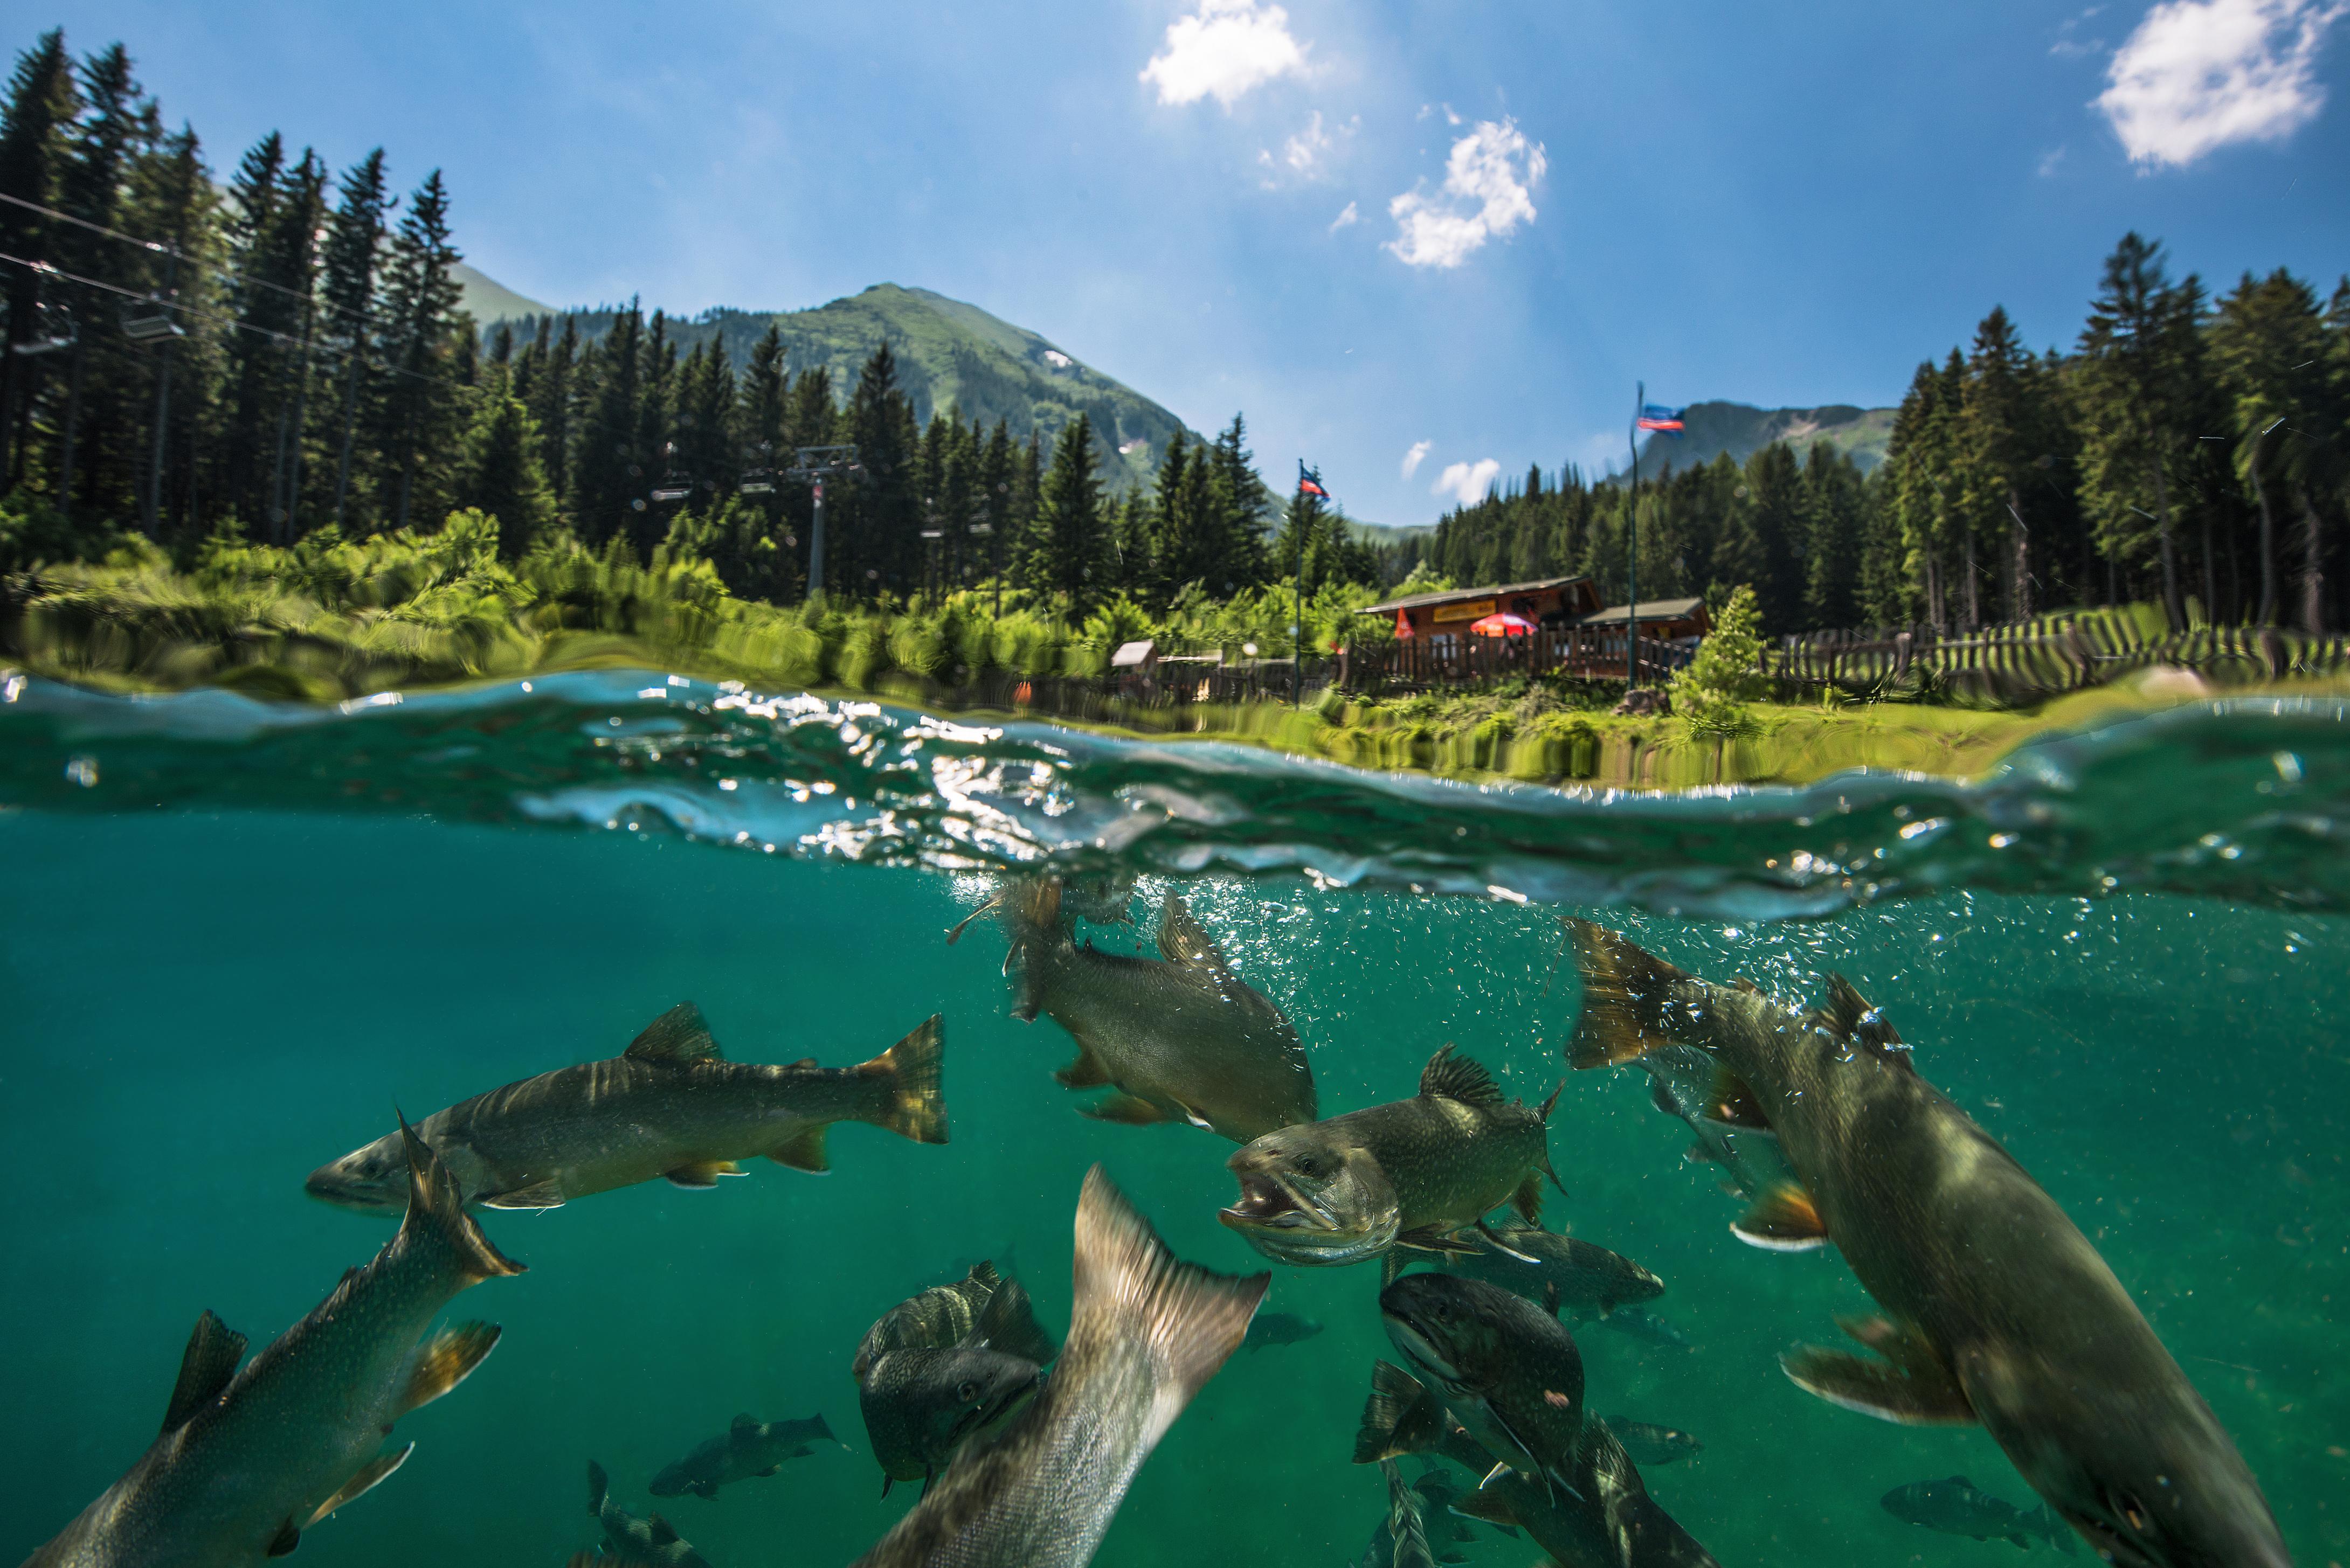 Underwater Photographer Michael Weberberger's Gallery ...